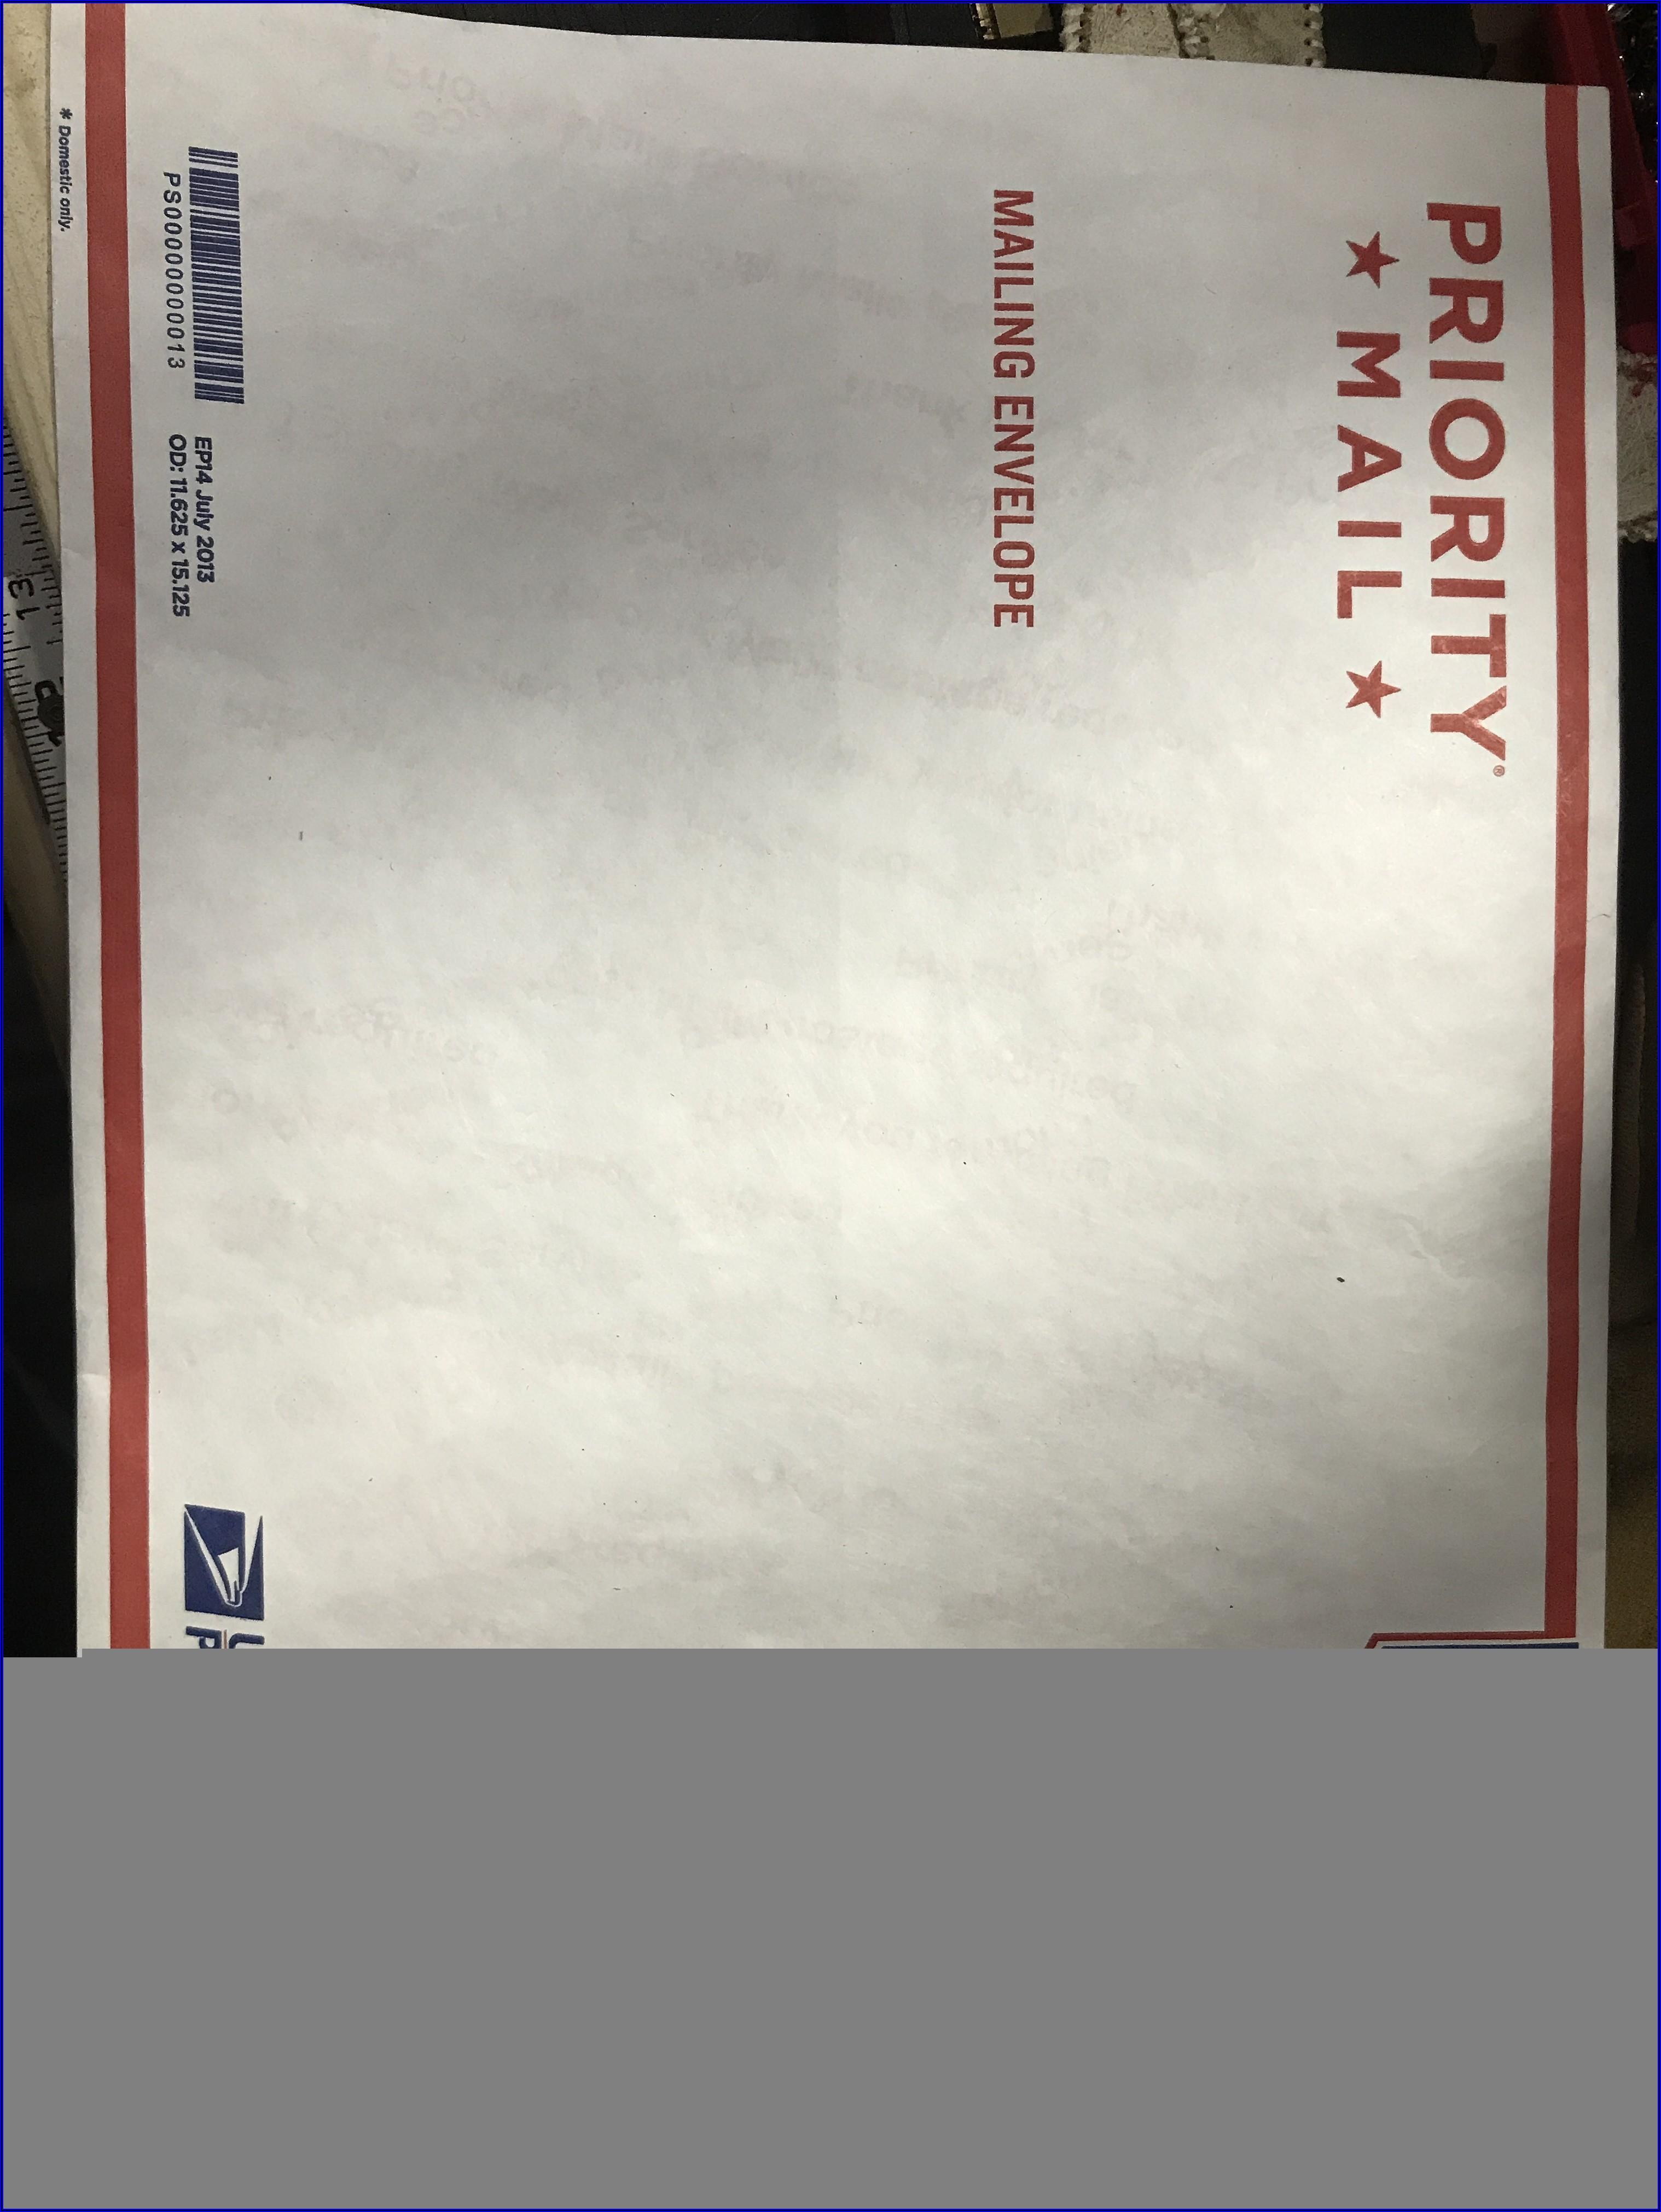 Usps Legal Flat Rate Envelope International